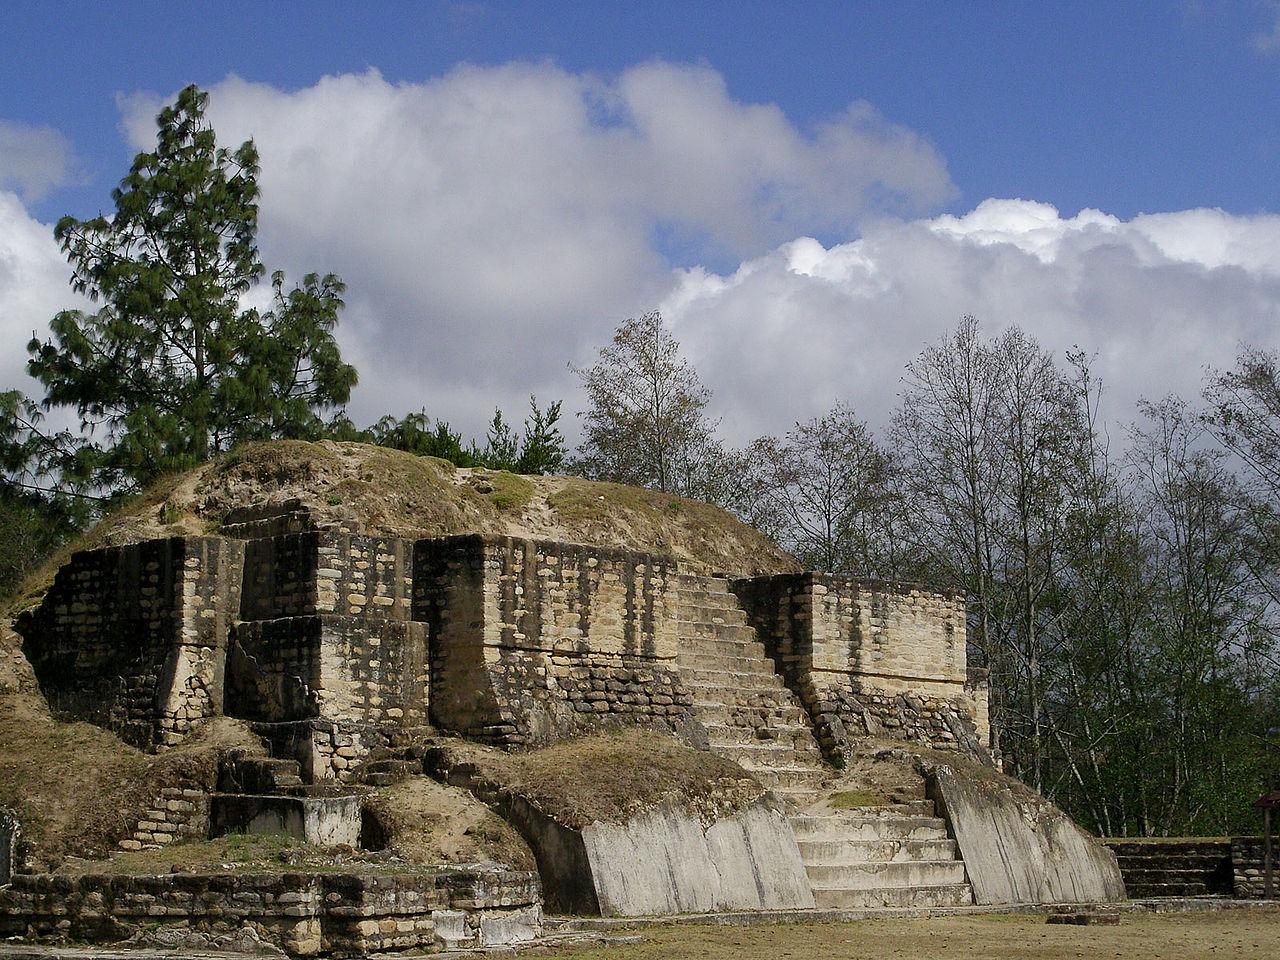 Mayan ruins in guatemala worth visiting besides tikal for Viviendas en ciudad real